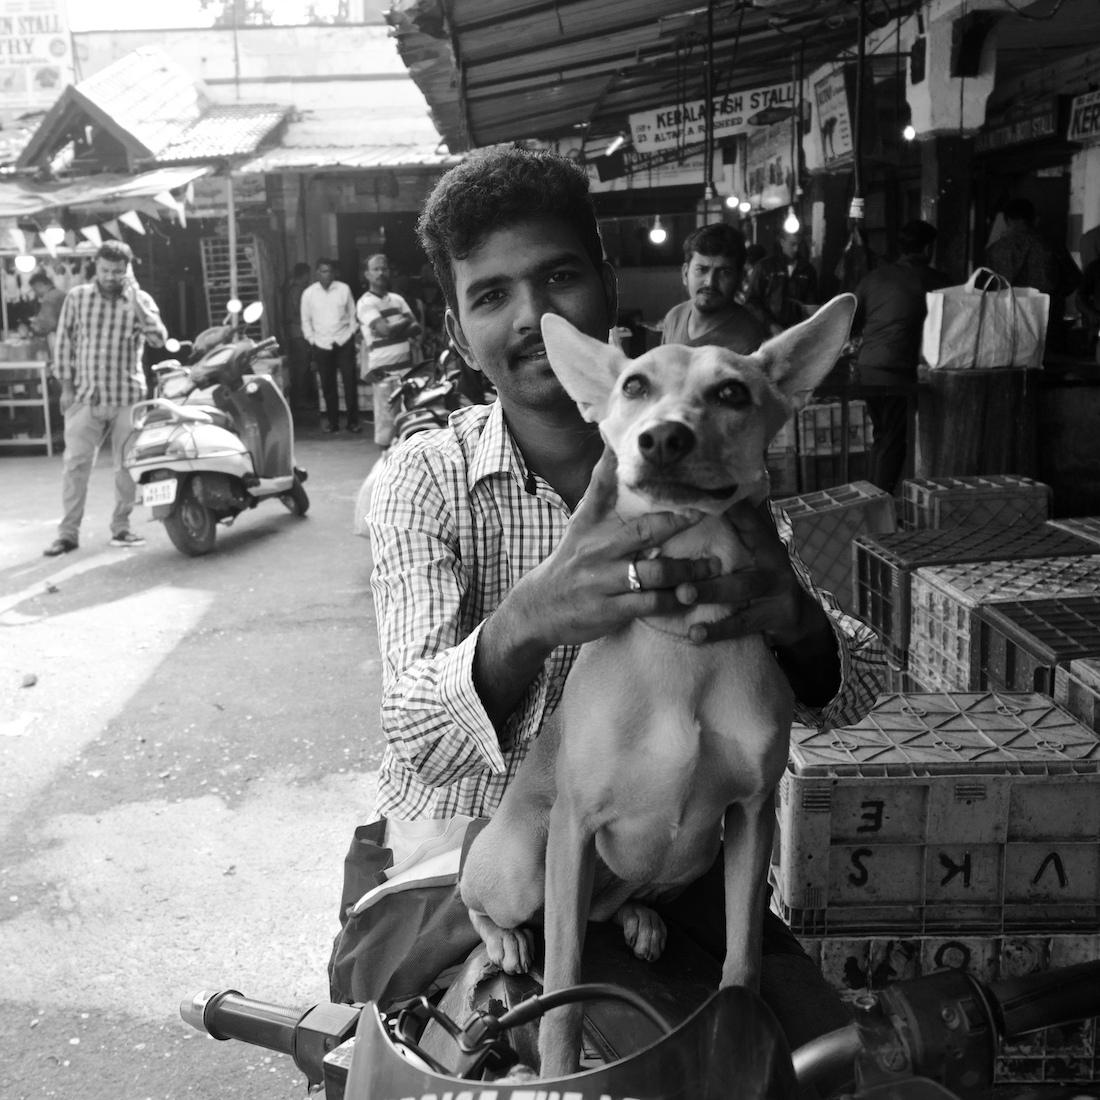 Man and dog on a bike